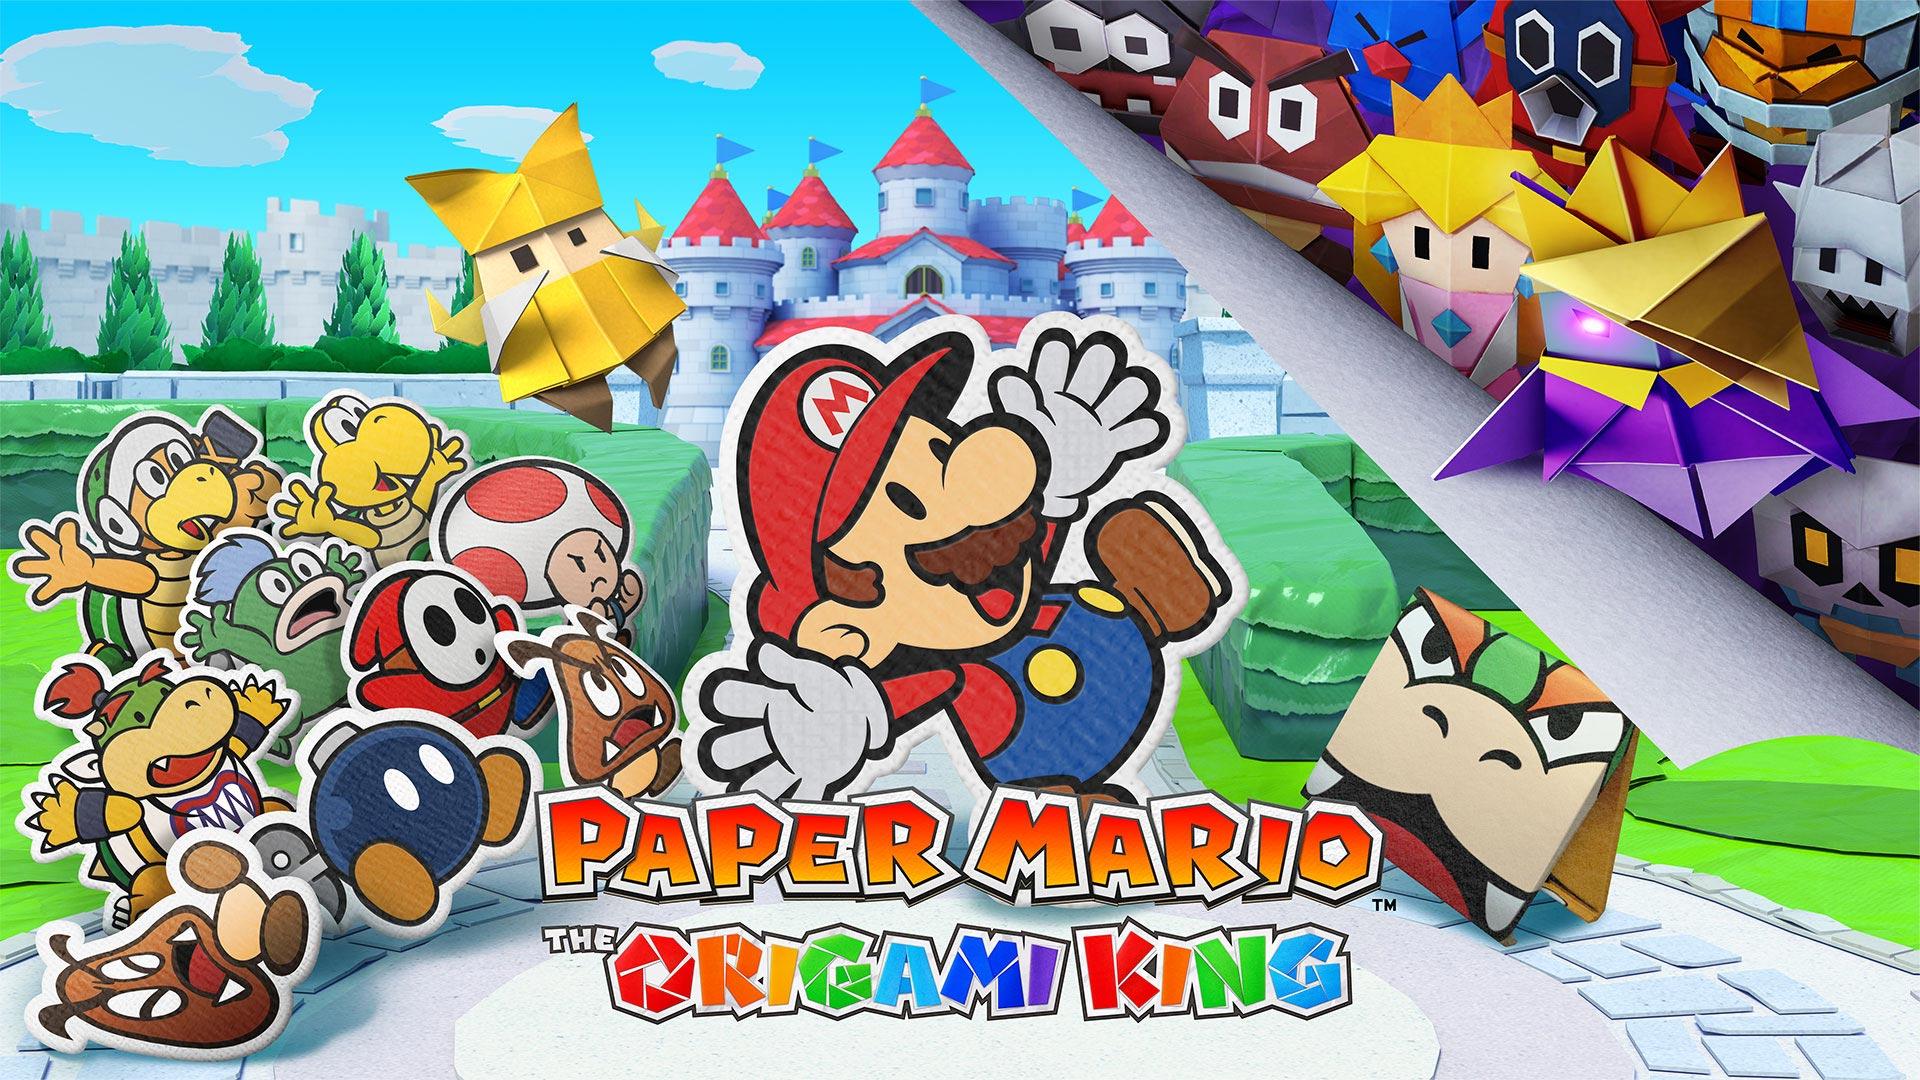 کاغذ ماریو: پادشاه اریگامی